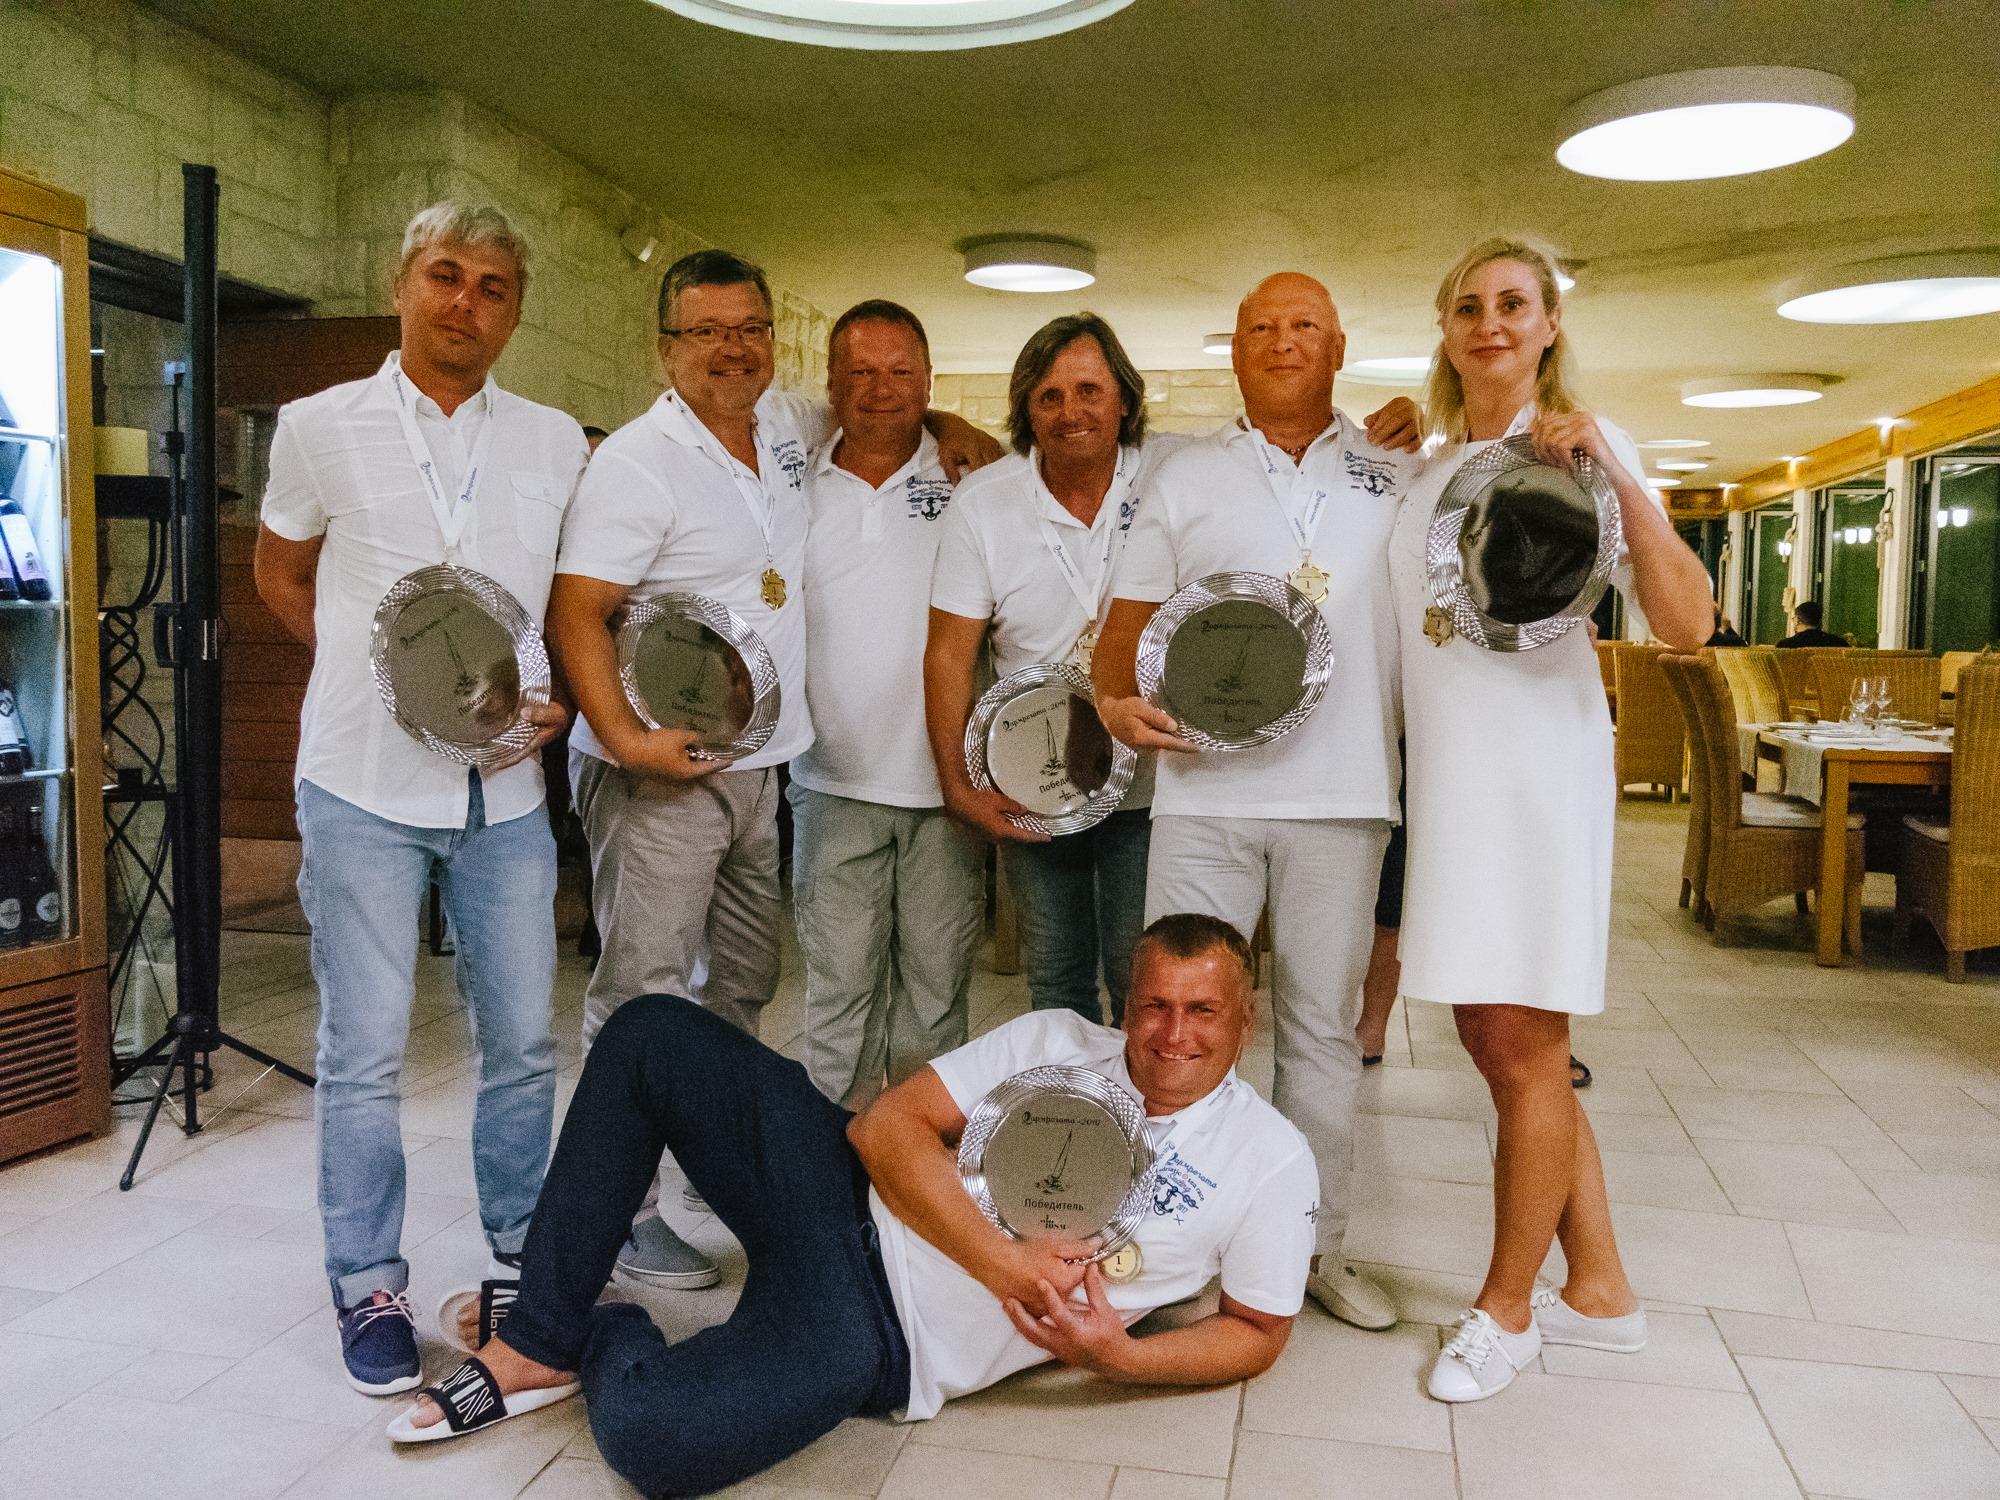 Победители фармрегаты 2019 - ДСМ групп Фармрегата 2019 - DSM Group Pharmregata 2019